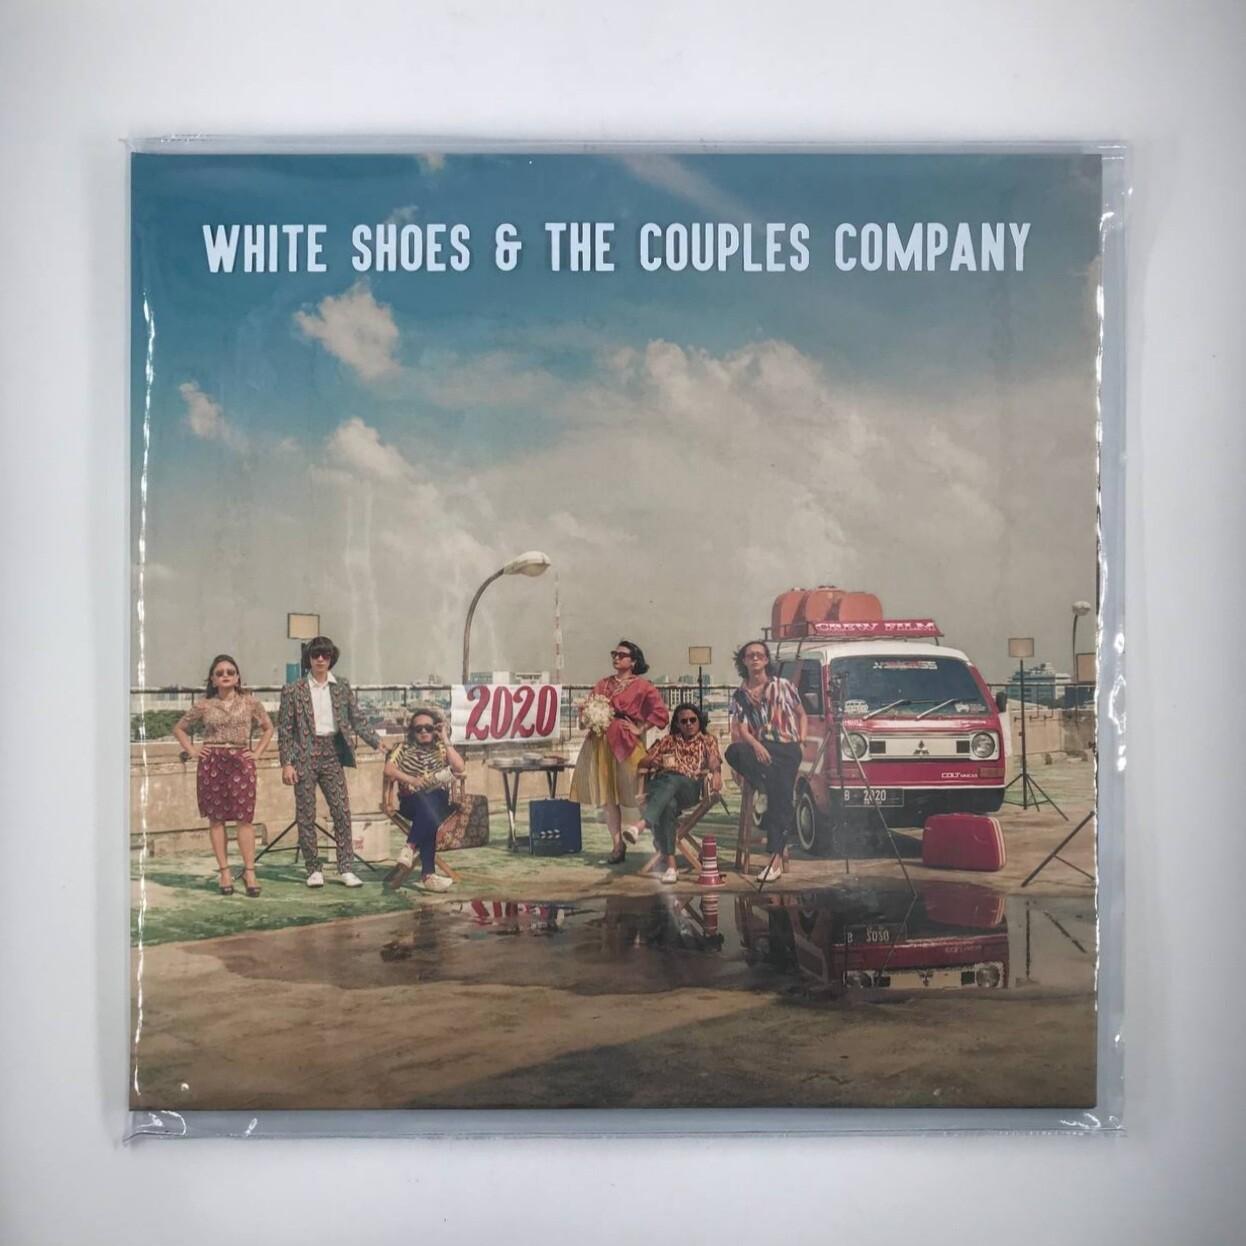 WHITE SHOES & THE COUPLES COMPANY -2020- LP